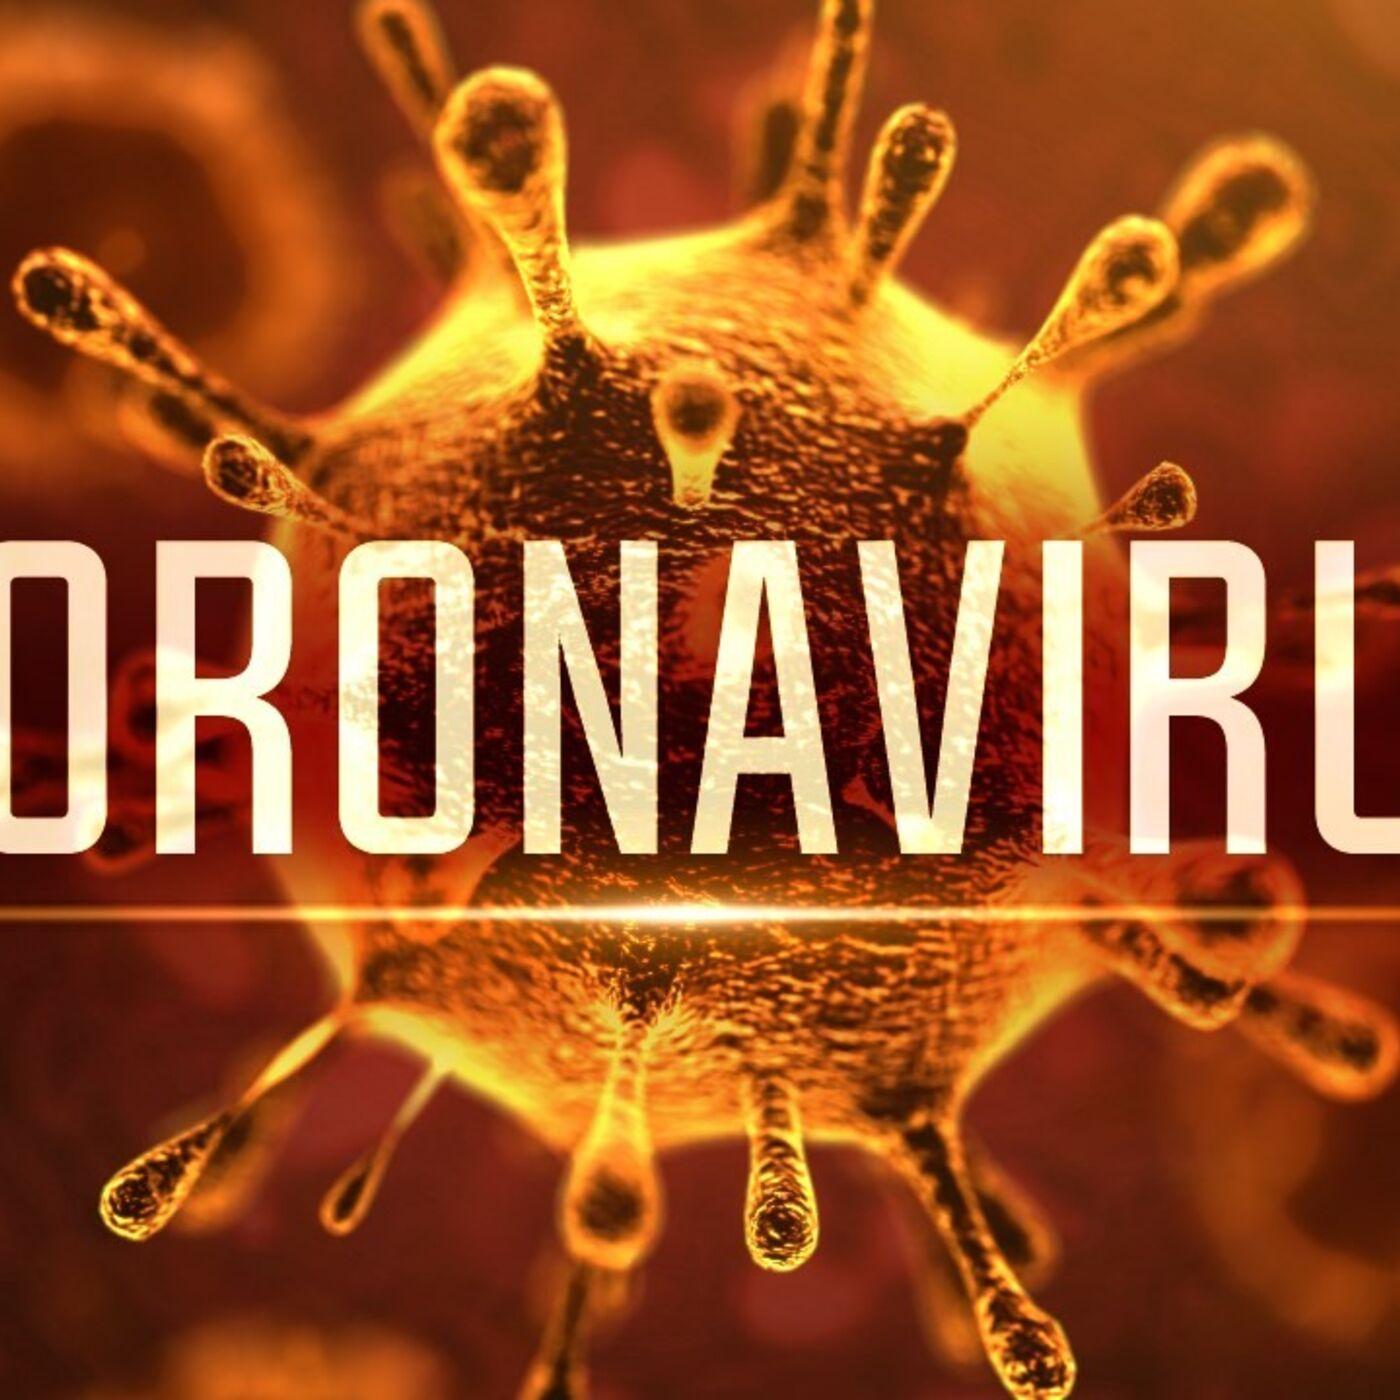 CoronaVirus: The Impact & Implication On The Supply Chain